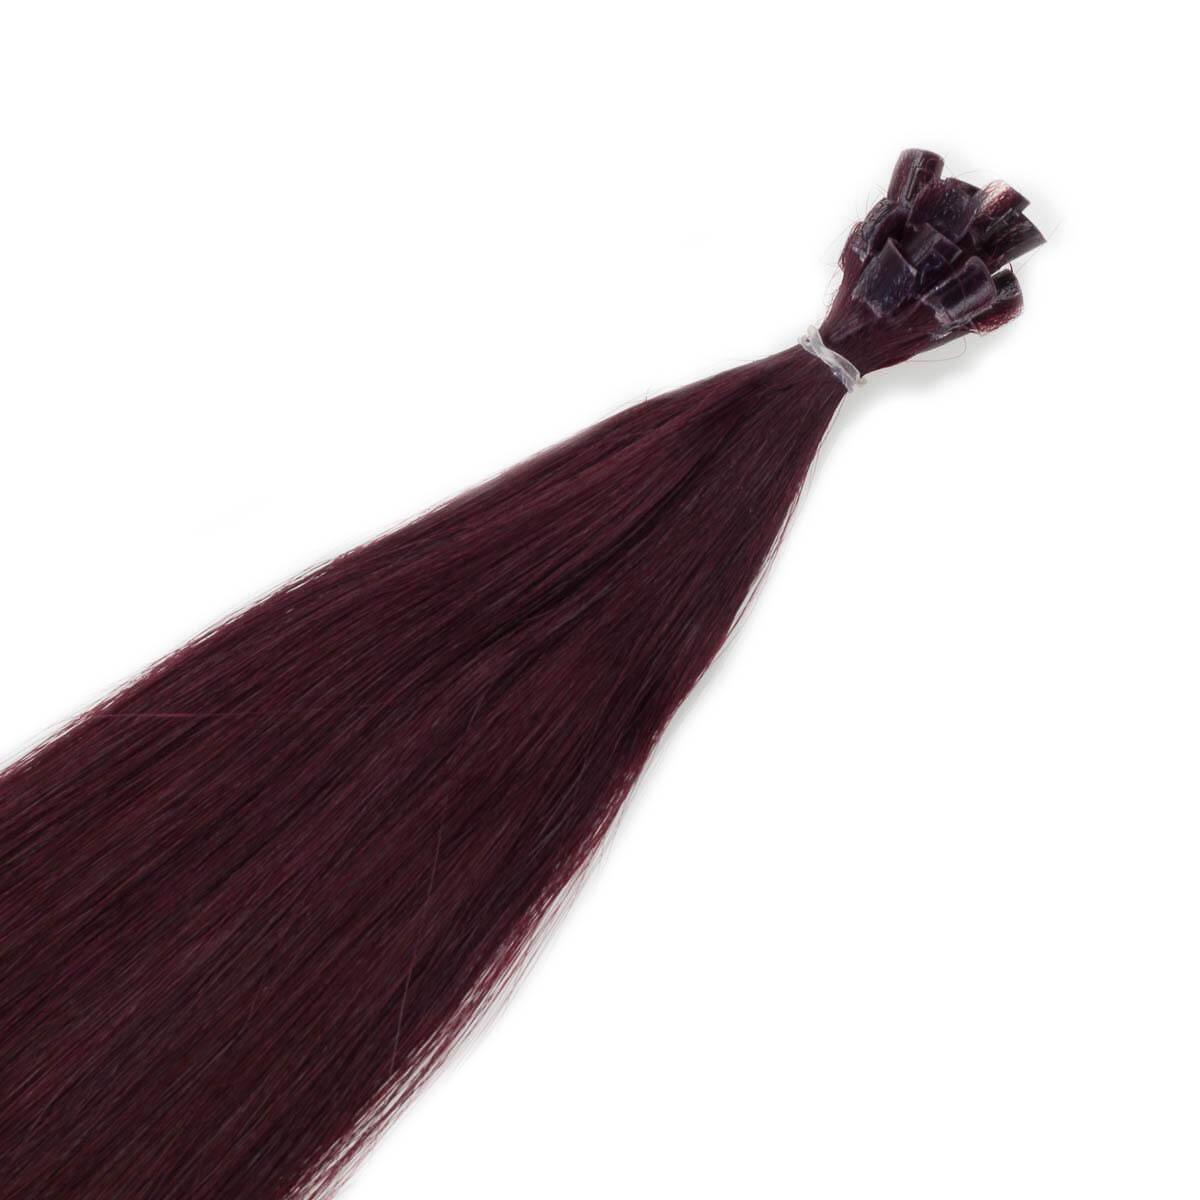 Bondings Original Glatt 6.12 Dark Mahogany Brown 50 cm